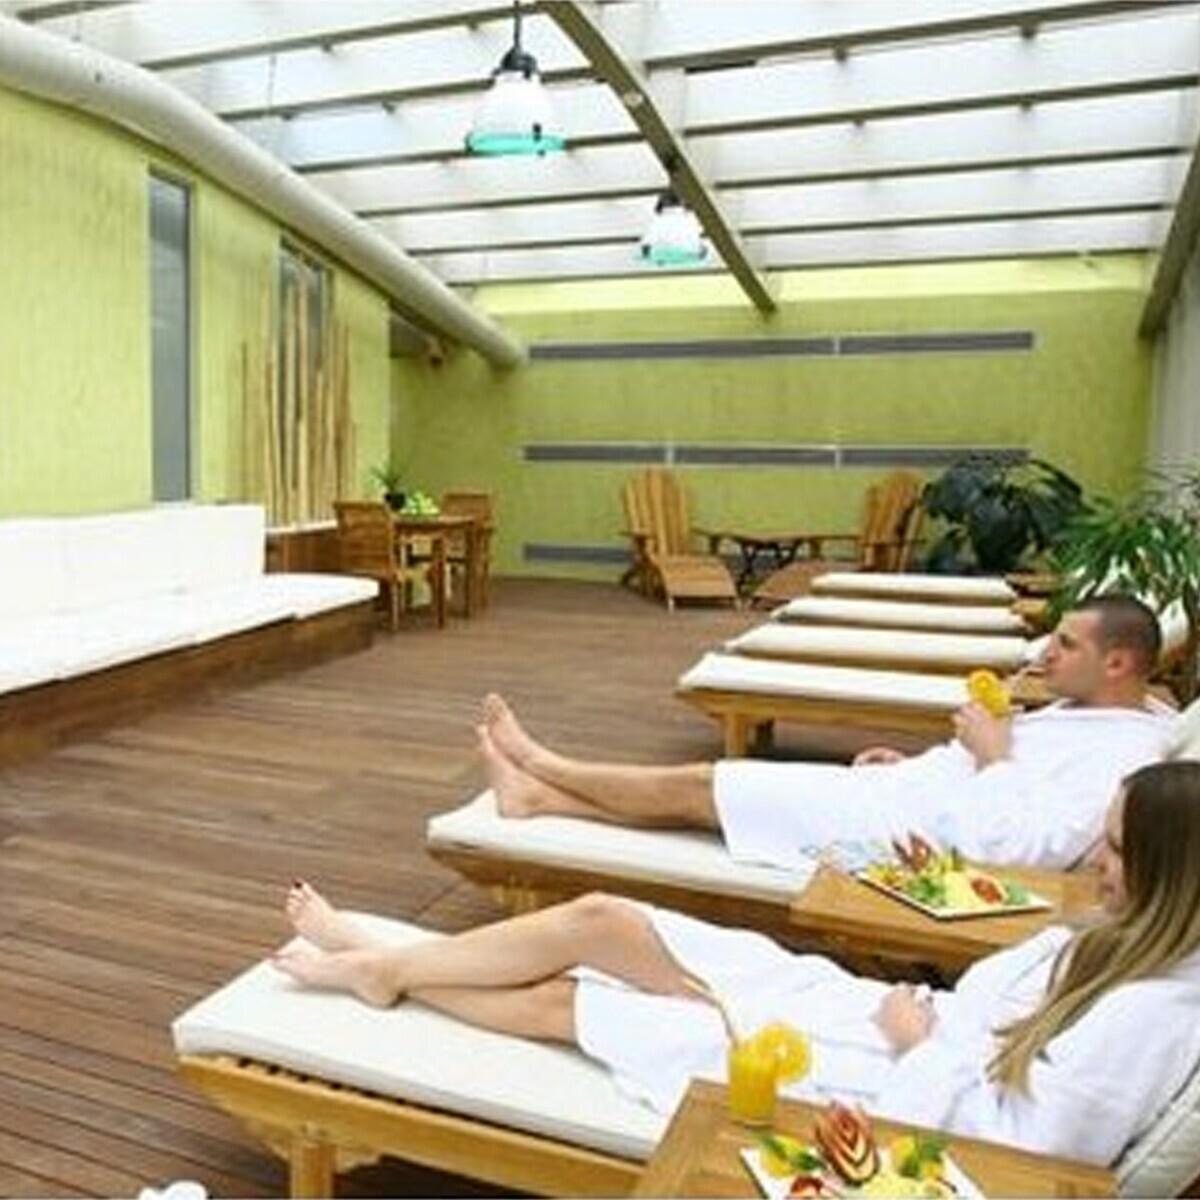 Holiday Inn Istanbul Airport Mandala Spa'da Masaj, Islak Alan Kullanım